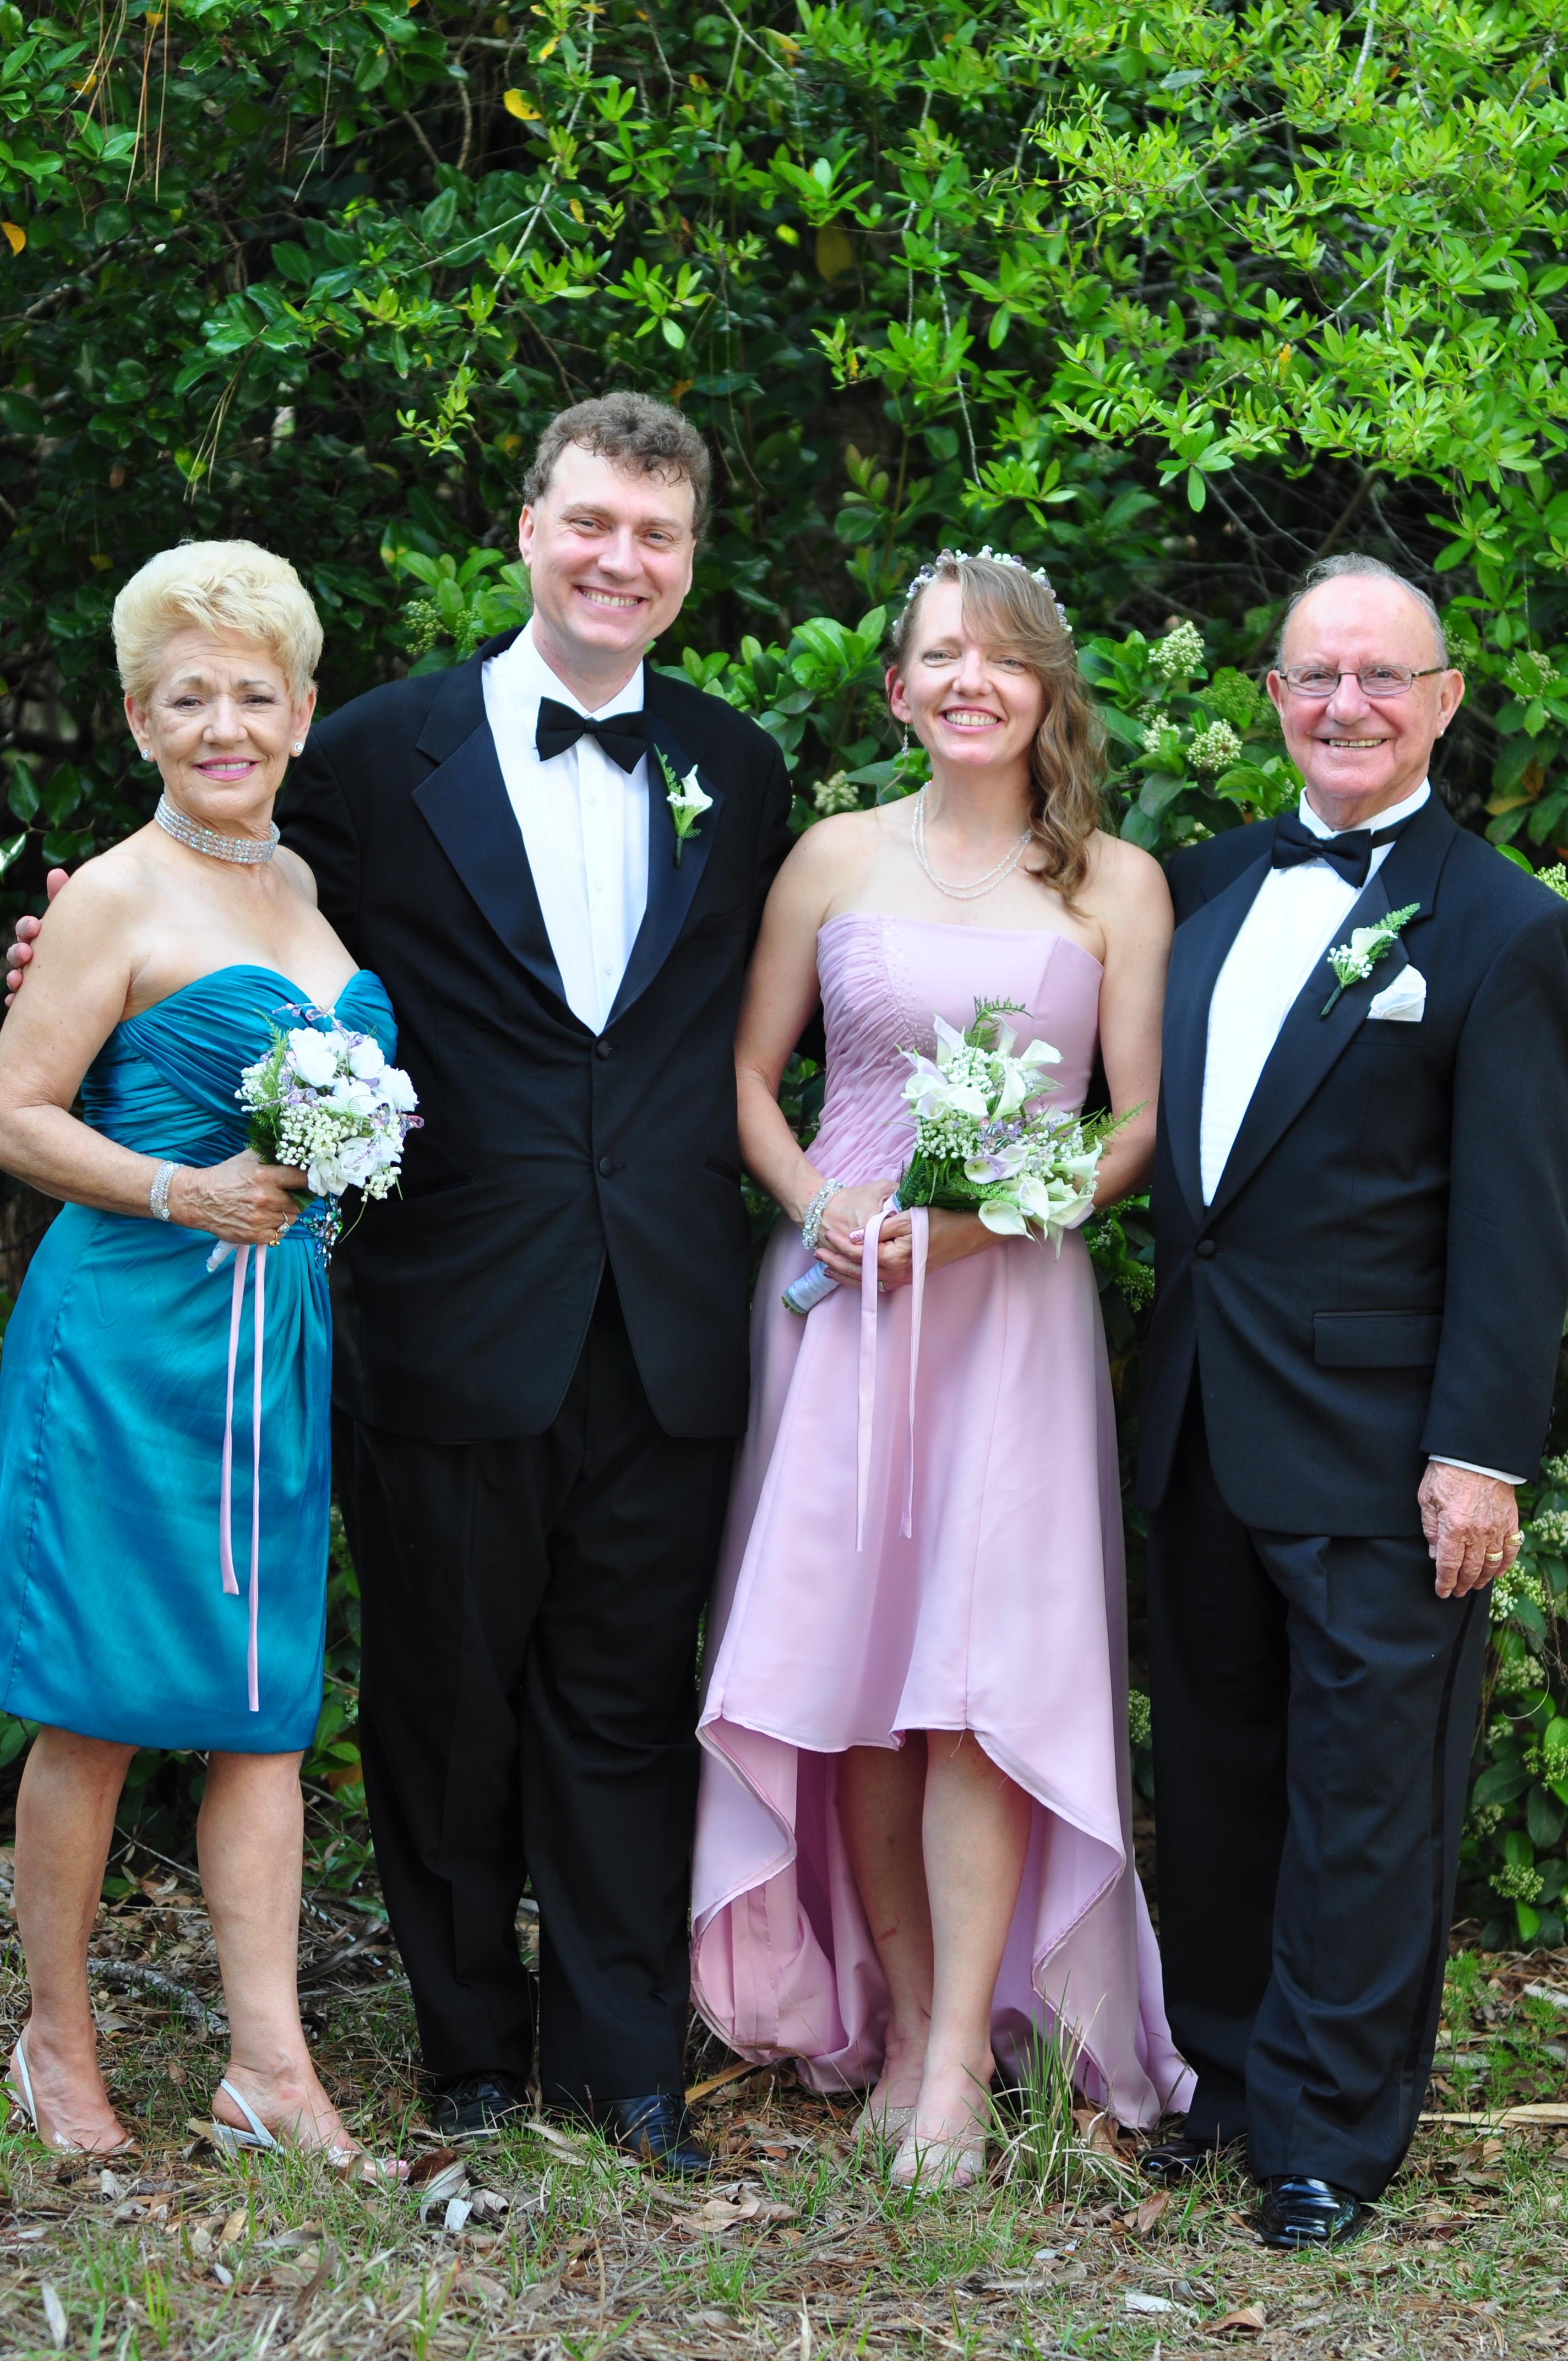 emily-and-travis-4-1-2013-april-fools-wedding-283